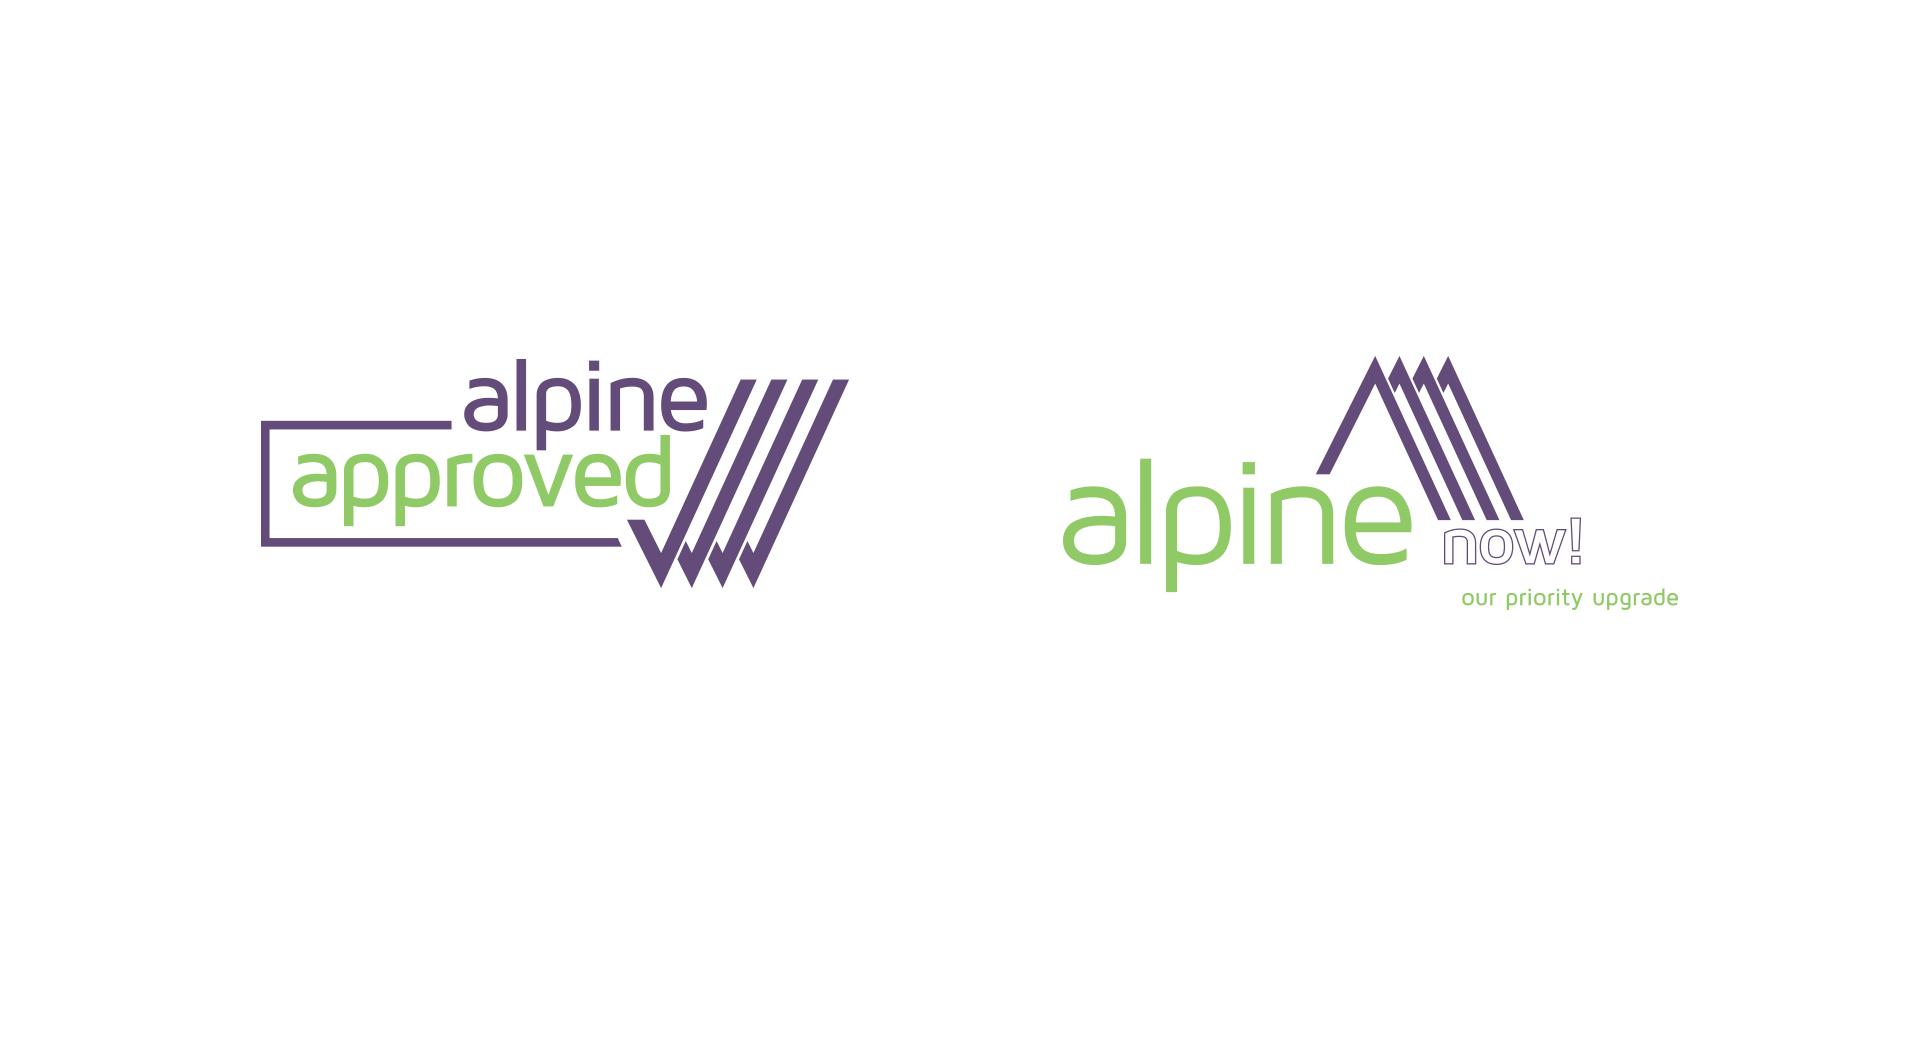 alpine brand devices